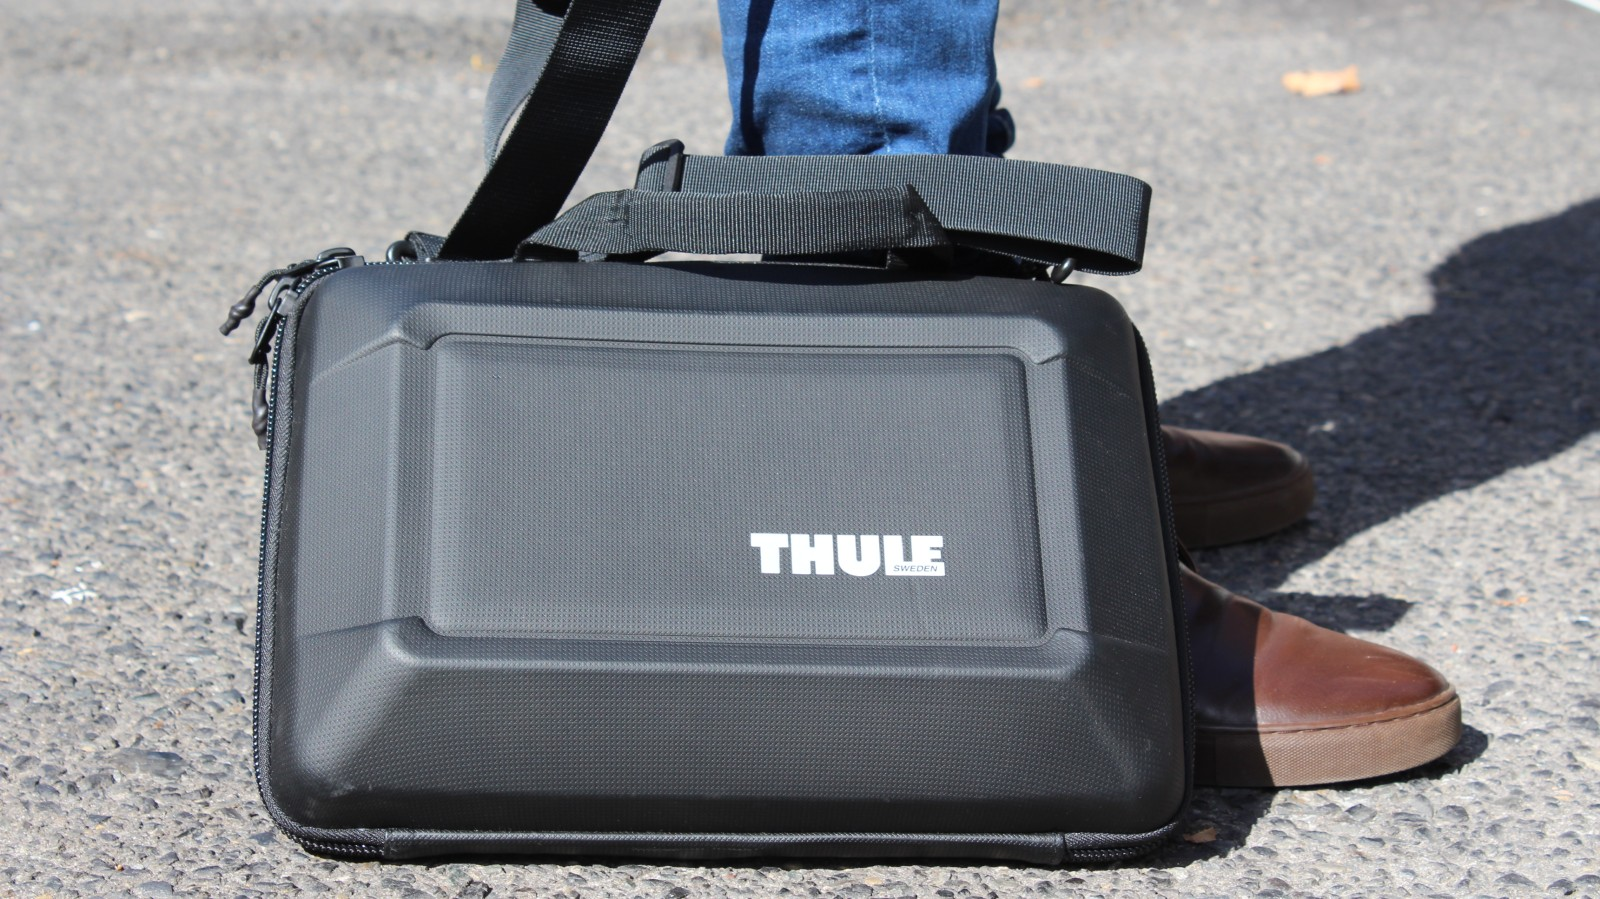 thule gauntlett review 2